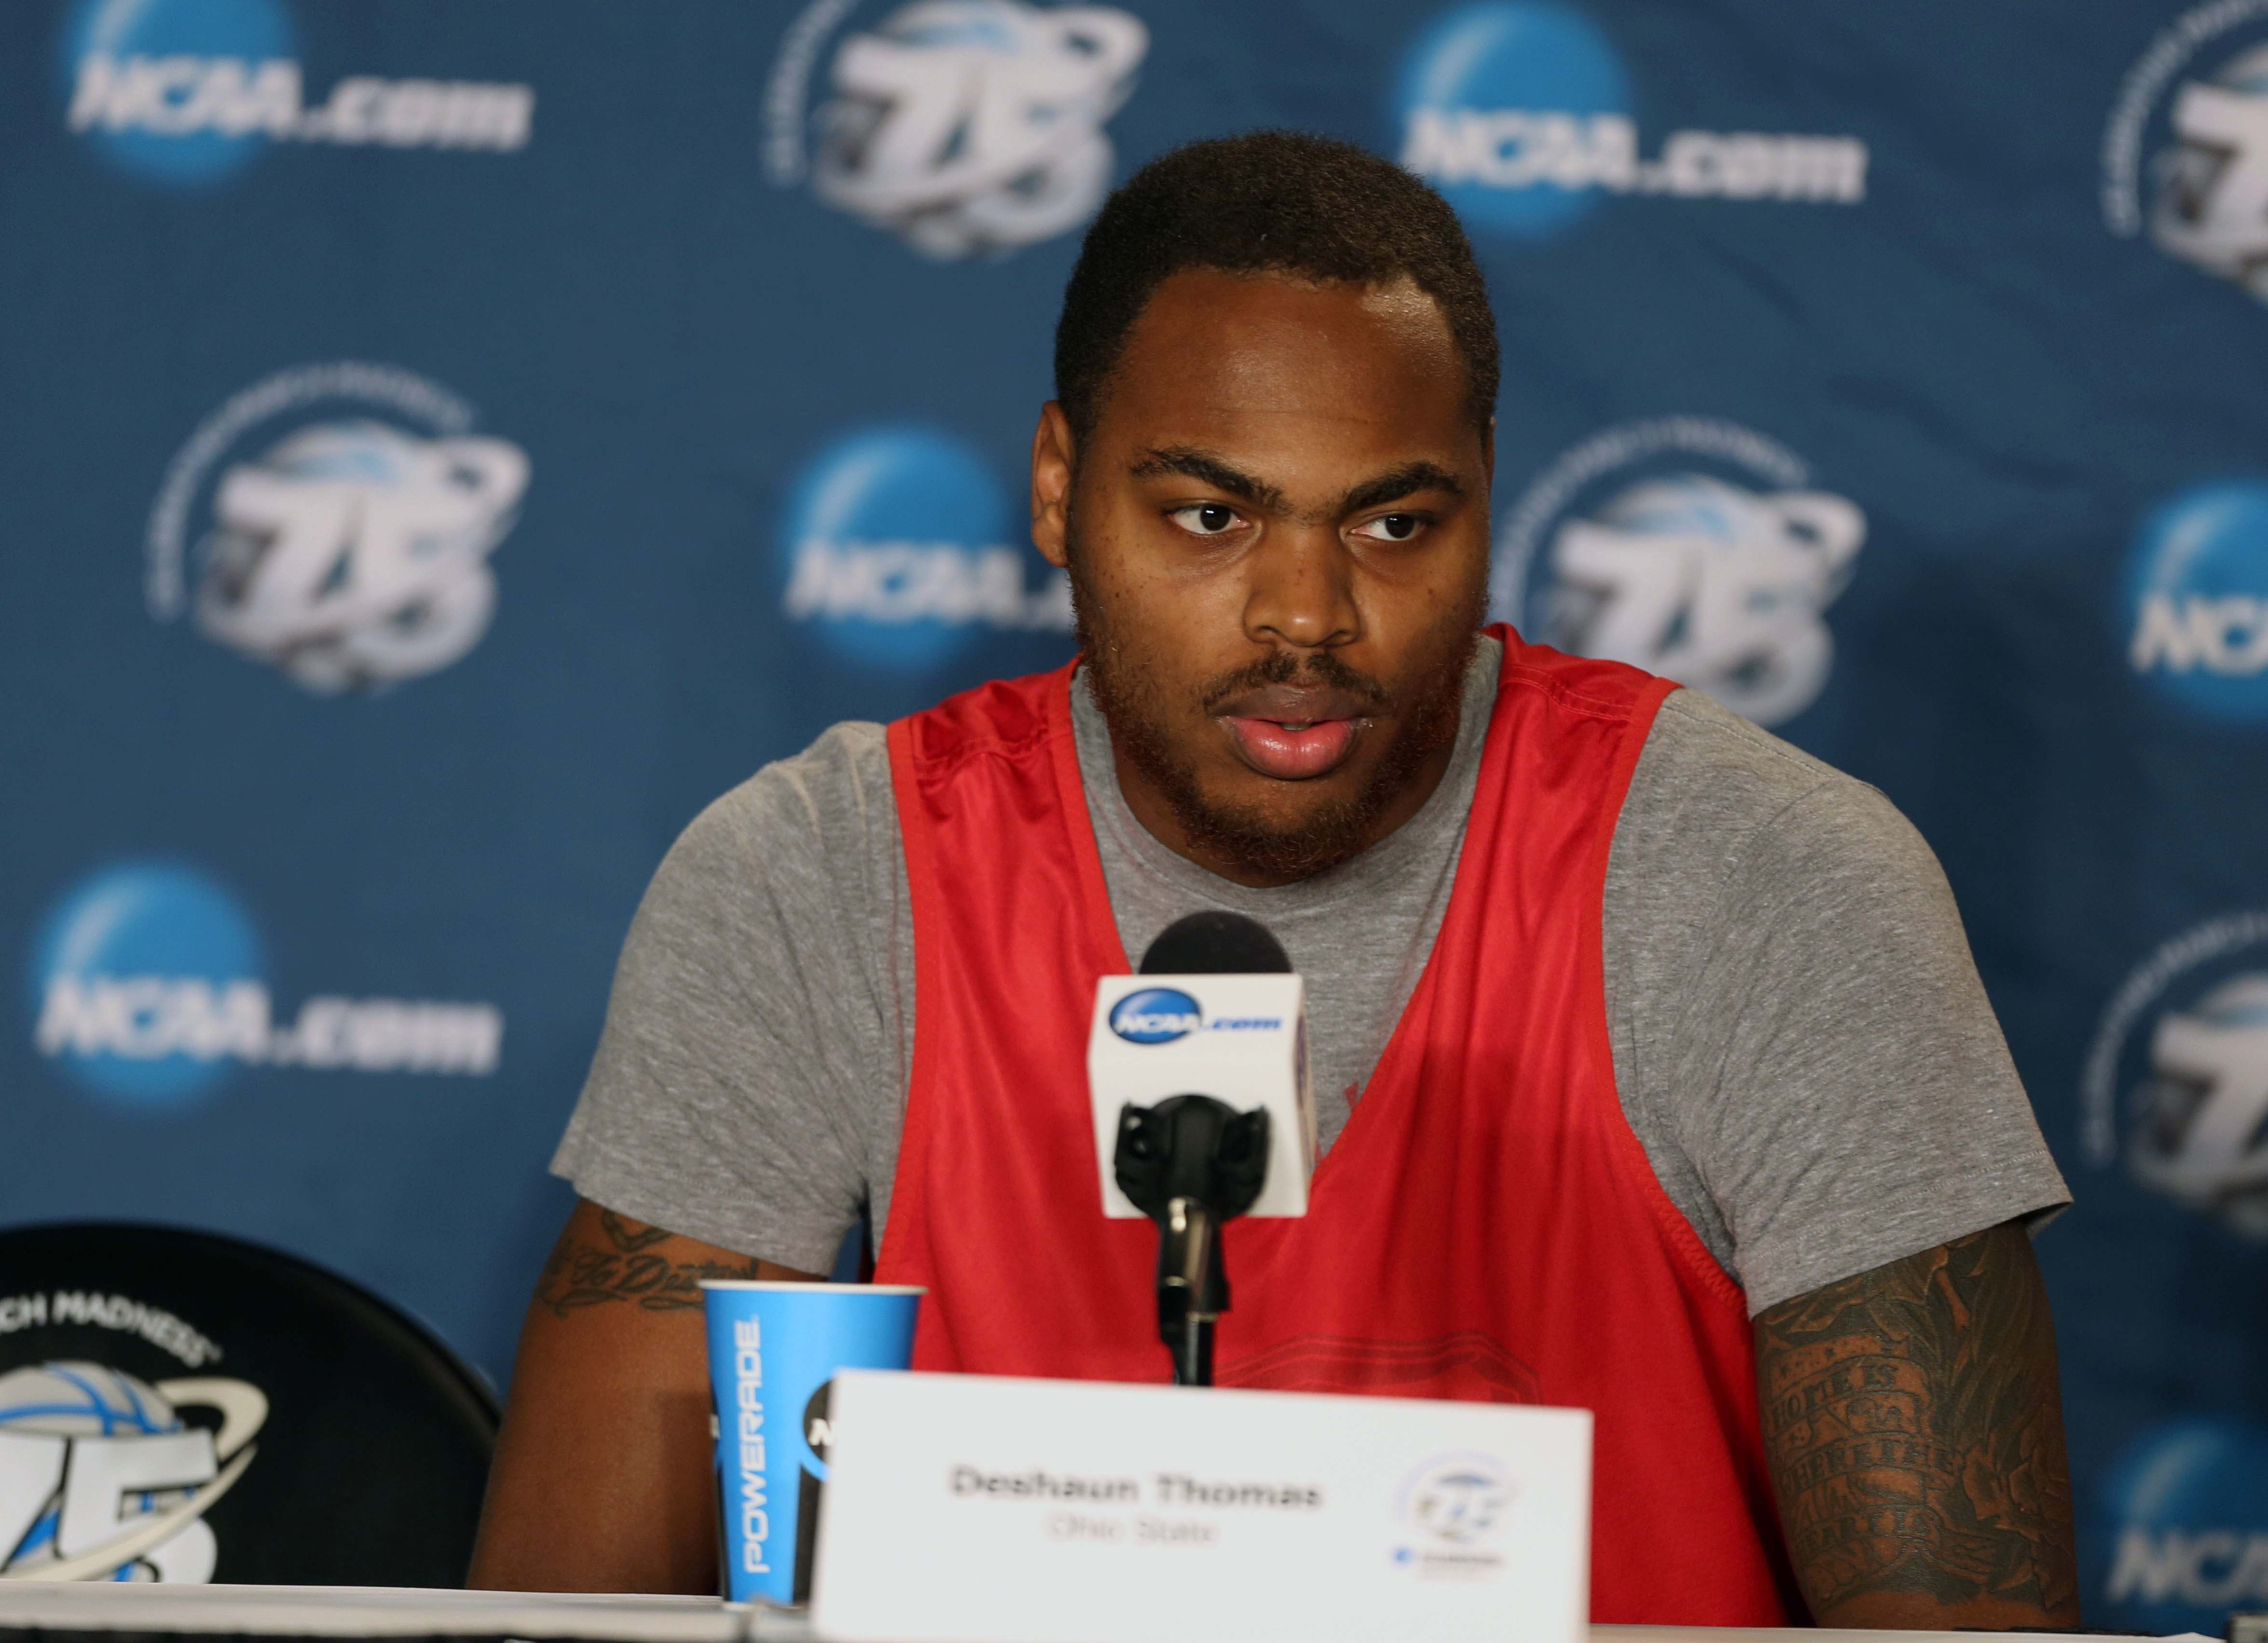 Will Fort Wayne native, DeShaun Thomas pull the major upset and move on?